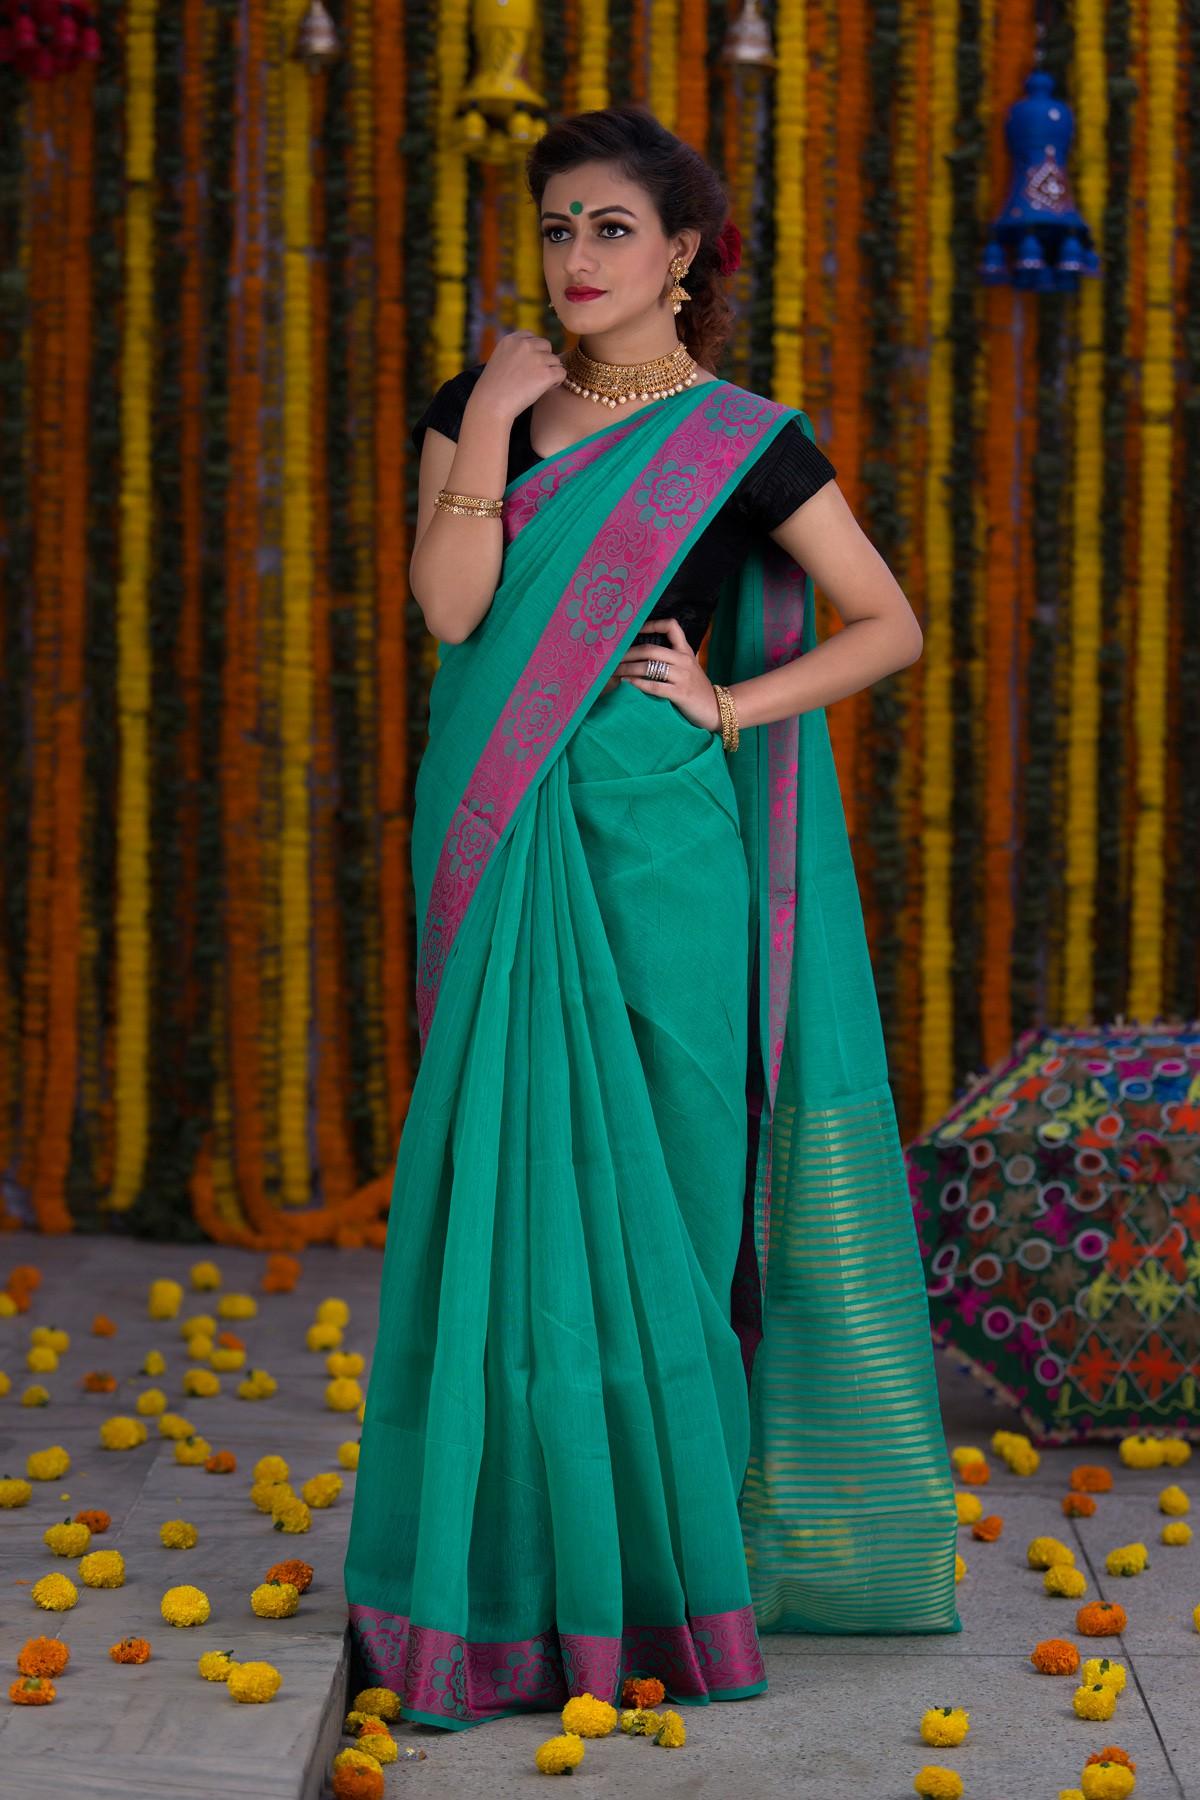 Green with purple Cotton saree